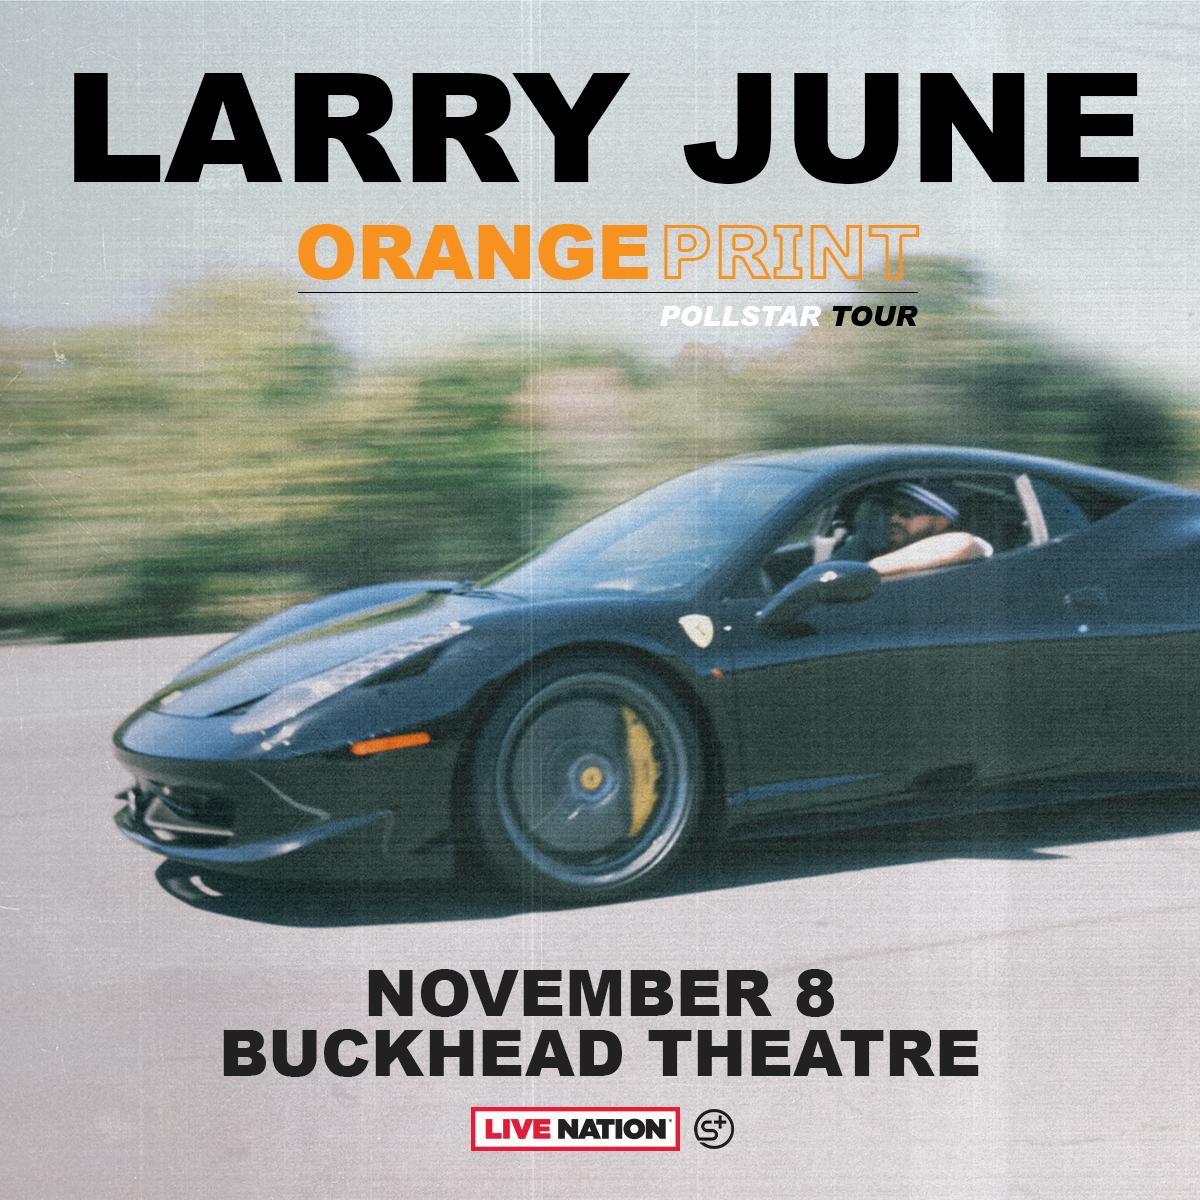 JUST ANNOUNCED: Larry June - Orange Print Pollstar Tour coming to Buckhead Theatre on November 8, 2021! Tickets go on sale Friday, September 24 @ 10am ET: ticketmaster.com/event/0E005B28…